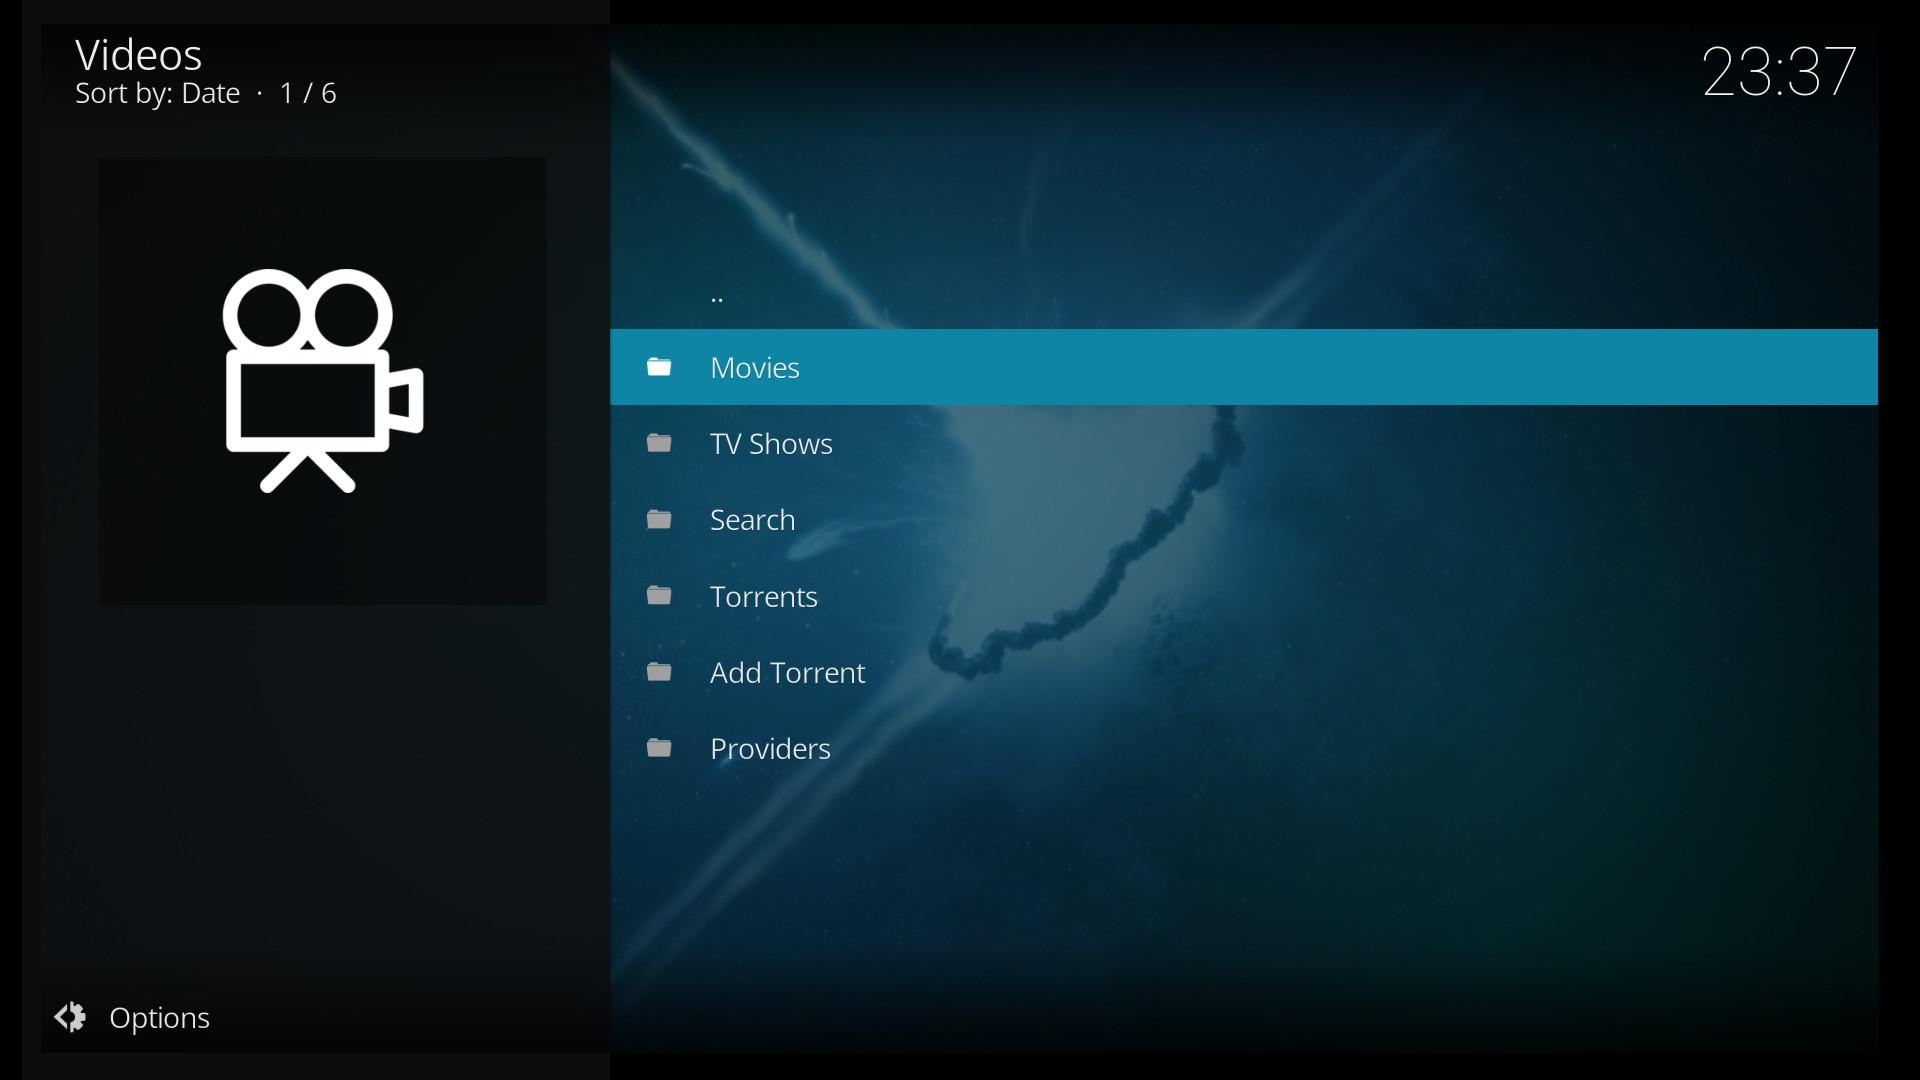 GitHub - scakemyer/plugin.video.quasar: Quasar add-on for Kodi